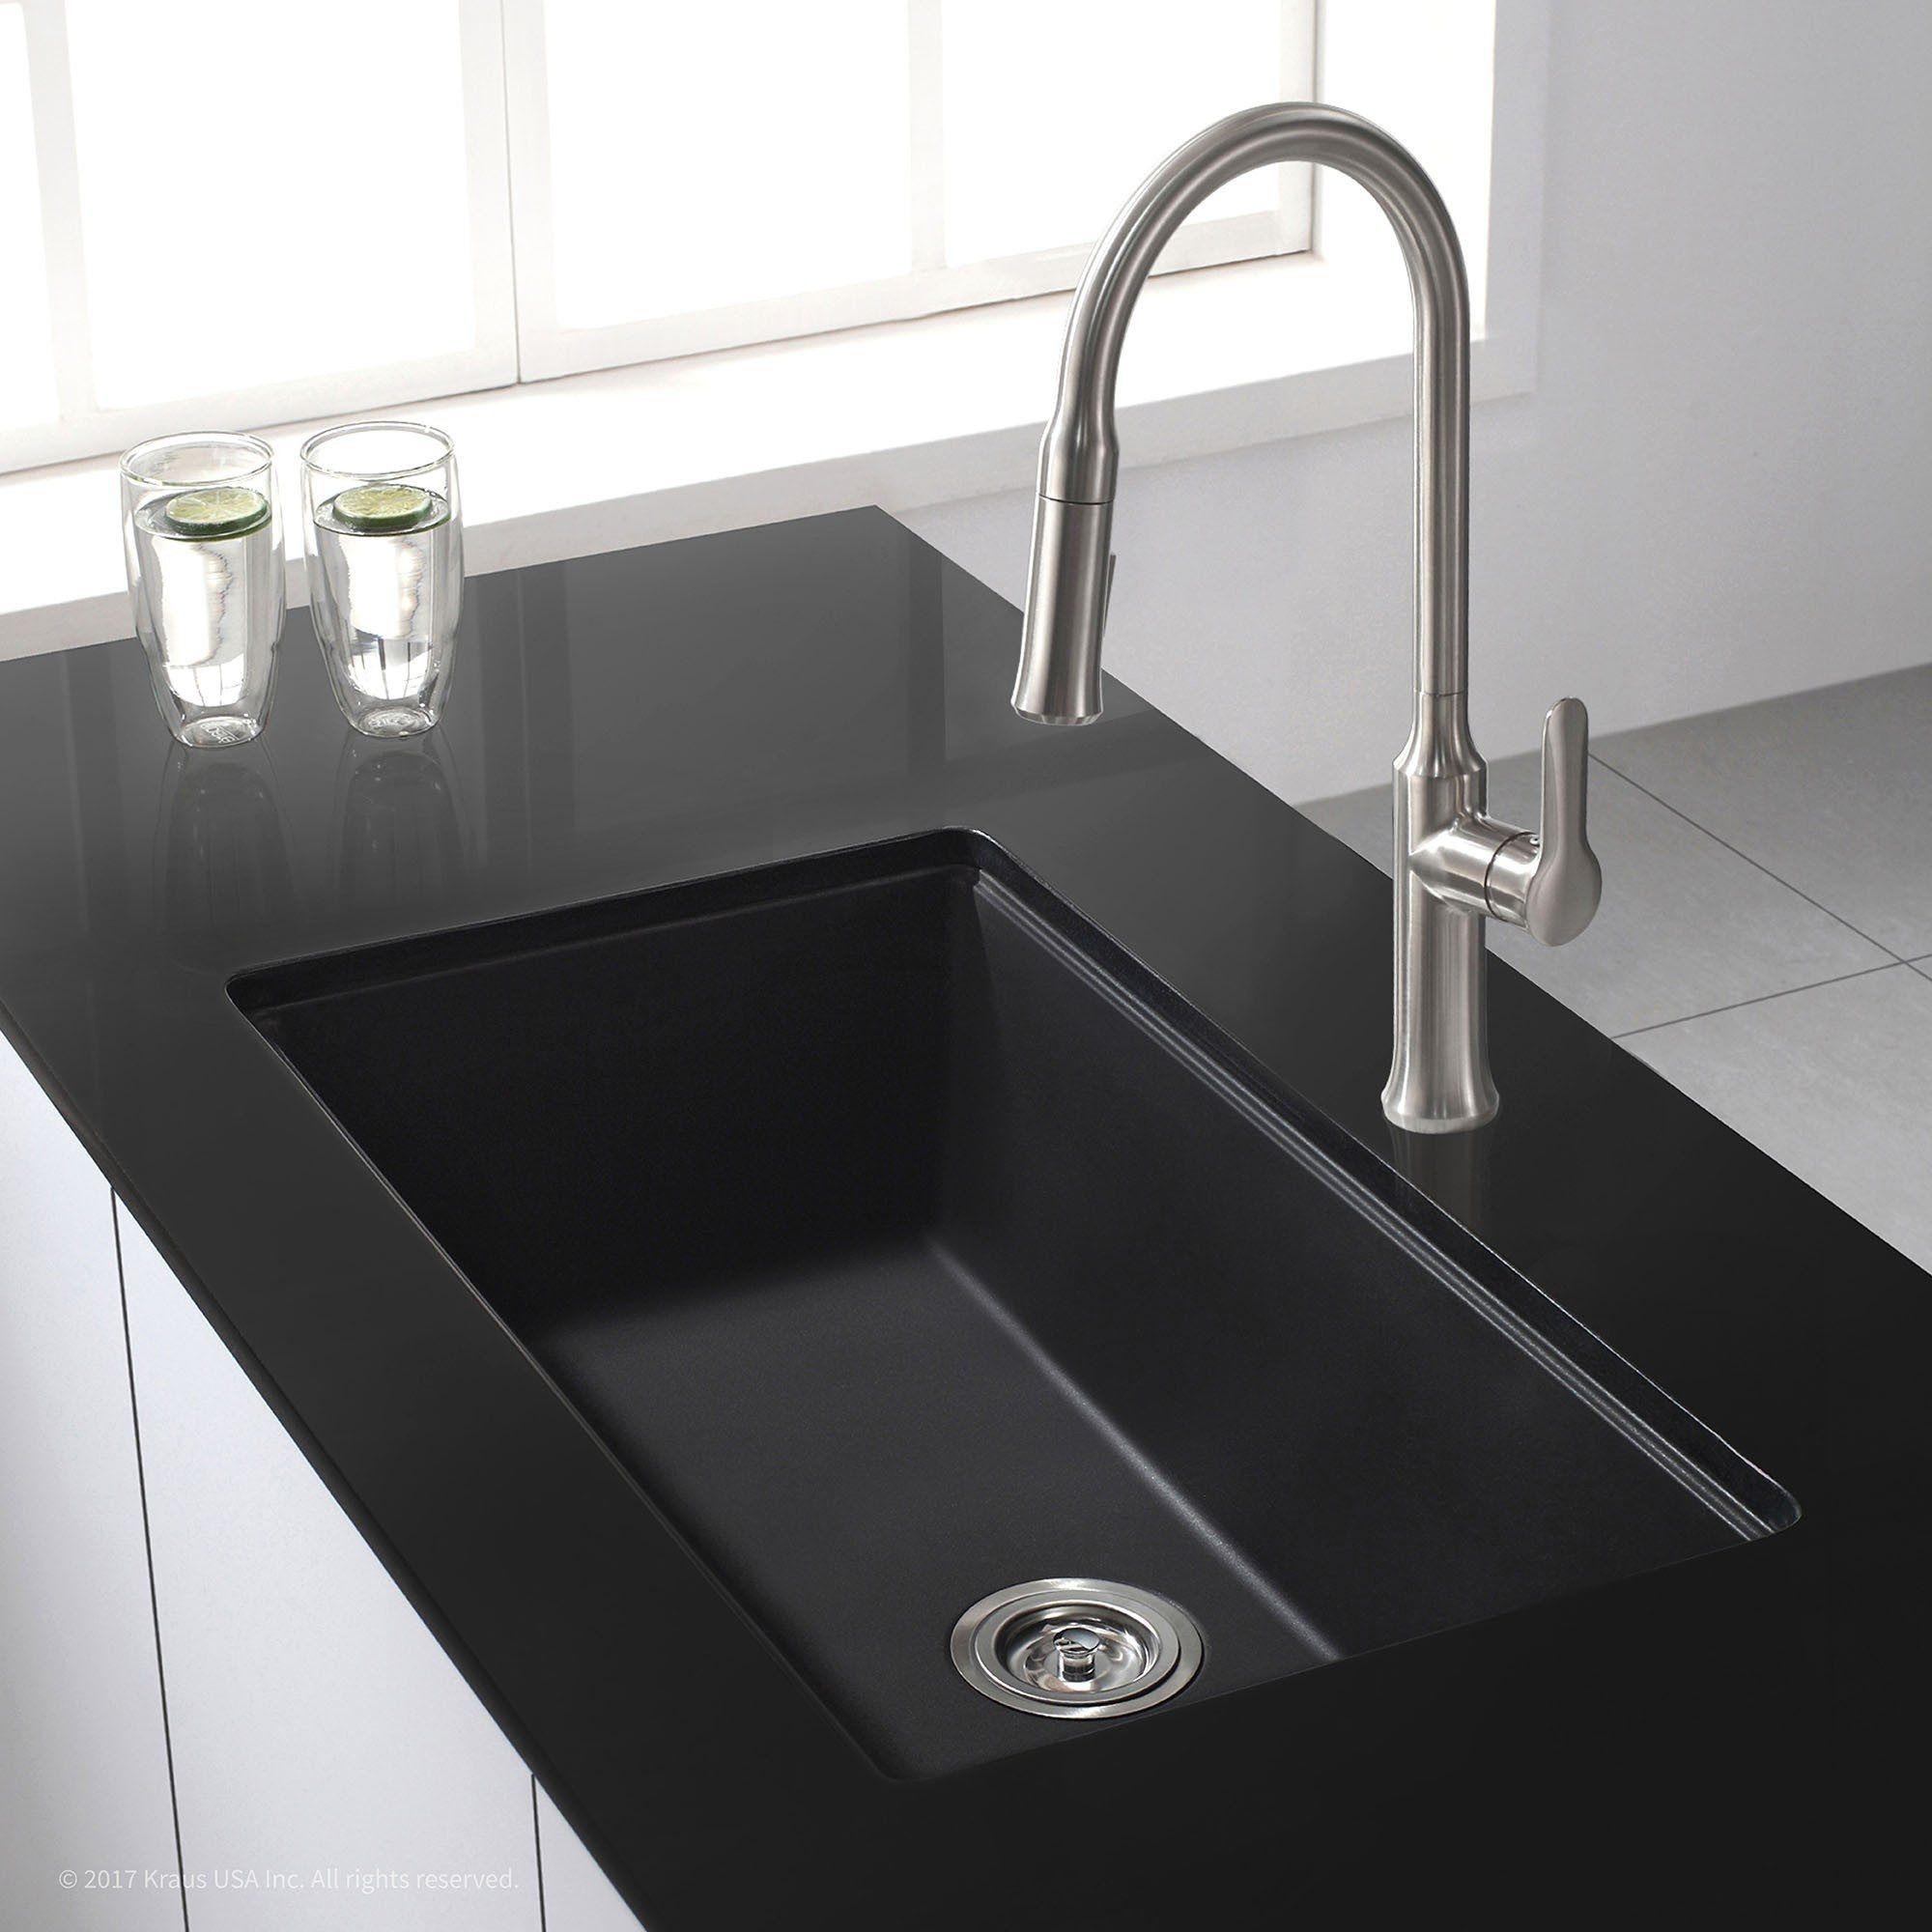 How Do You Clean A Black Granite Kitchen Sink Granite Kitchen